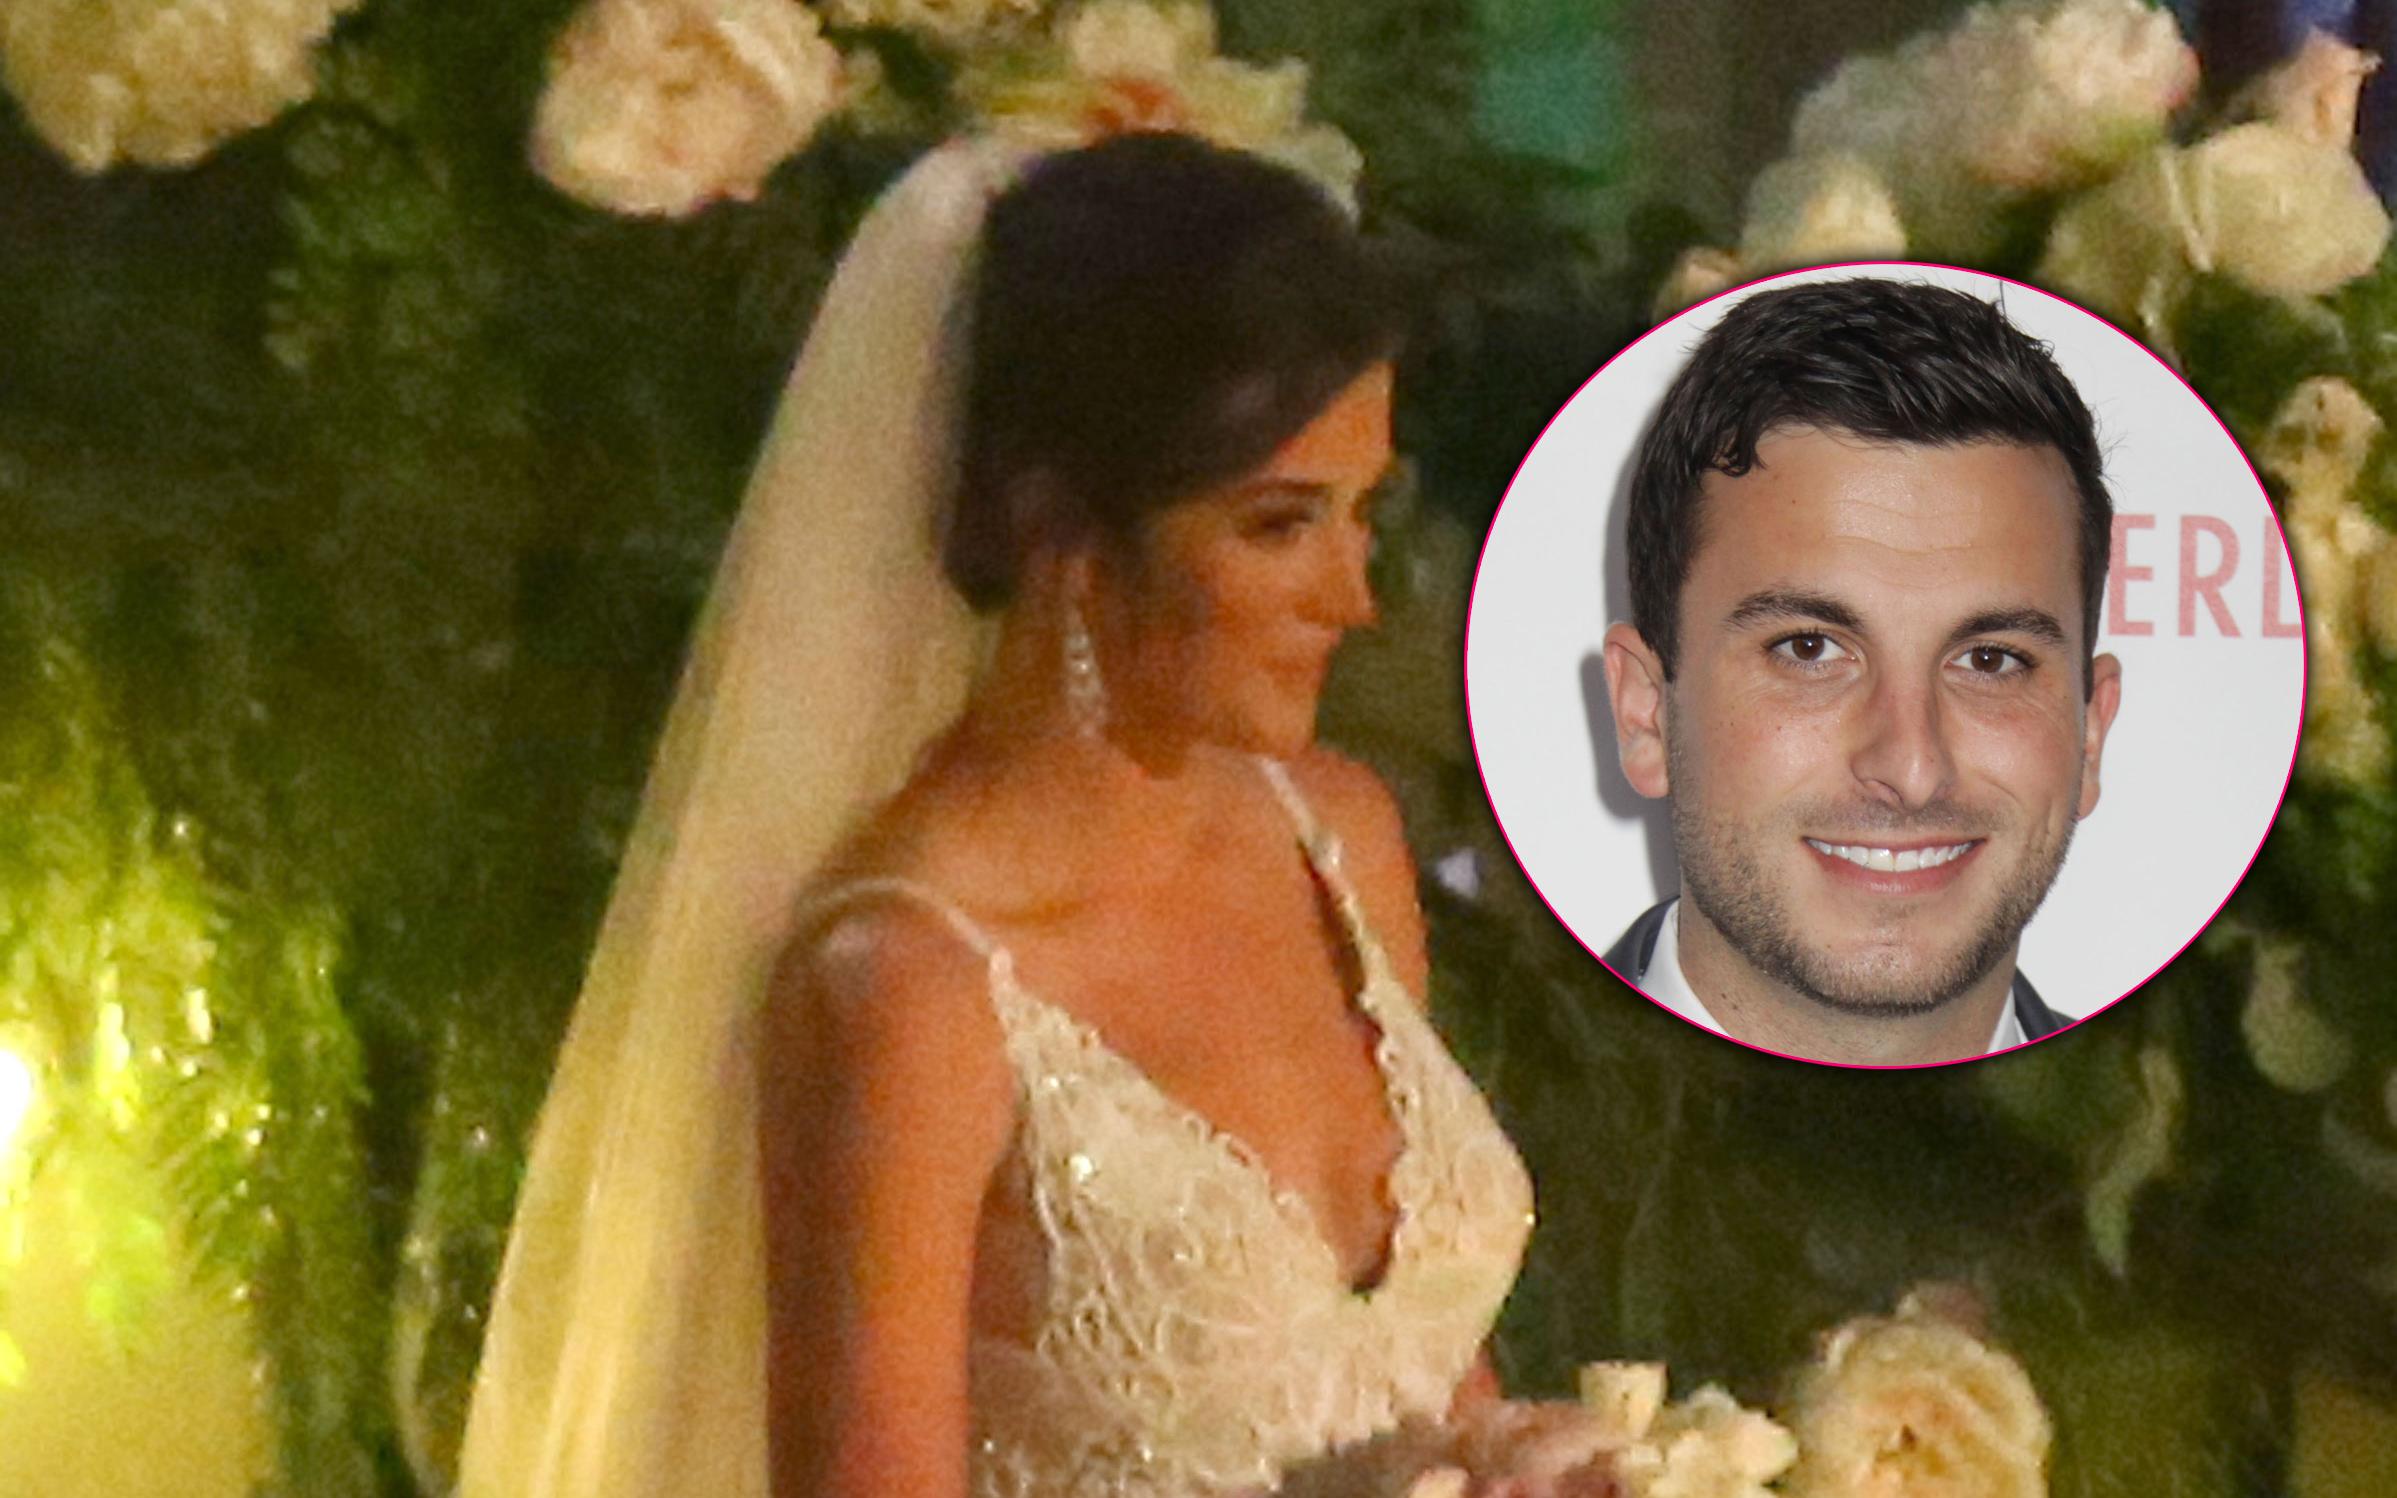 'The Bachelor' Contestant Jade Roper Marries Tanner Tolbert